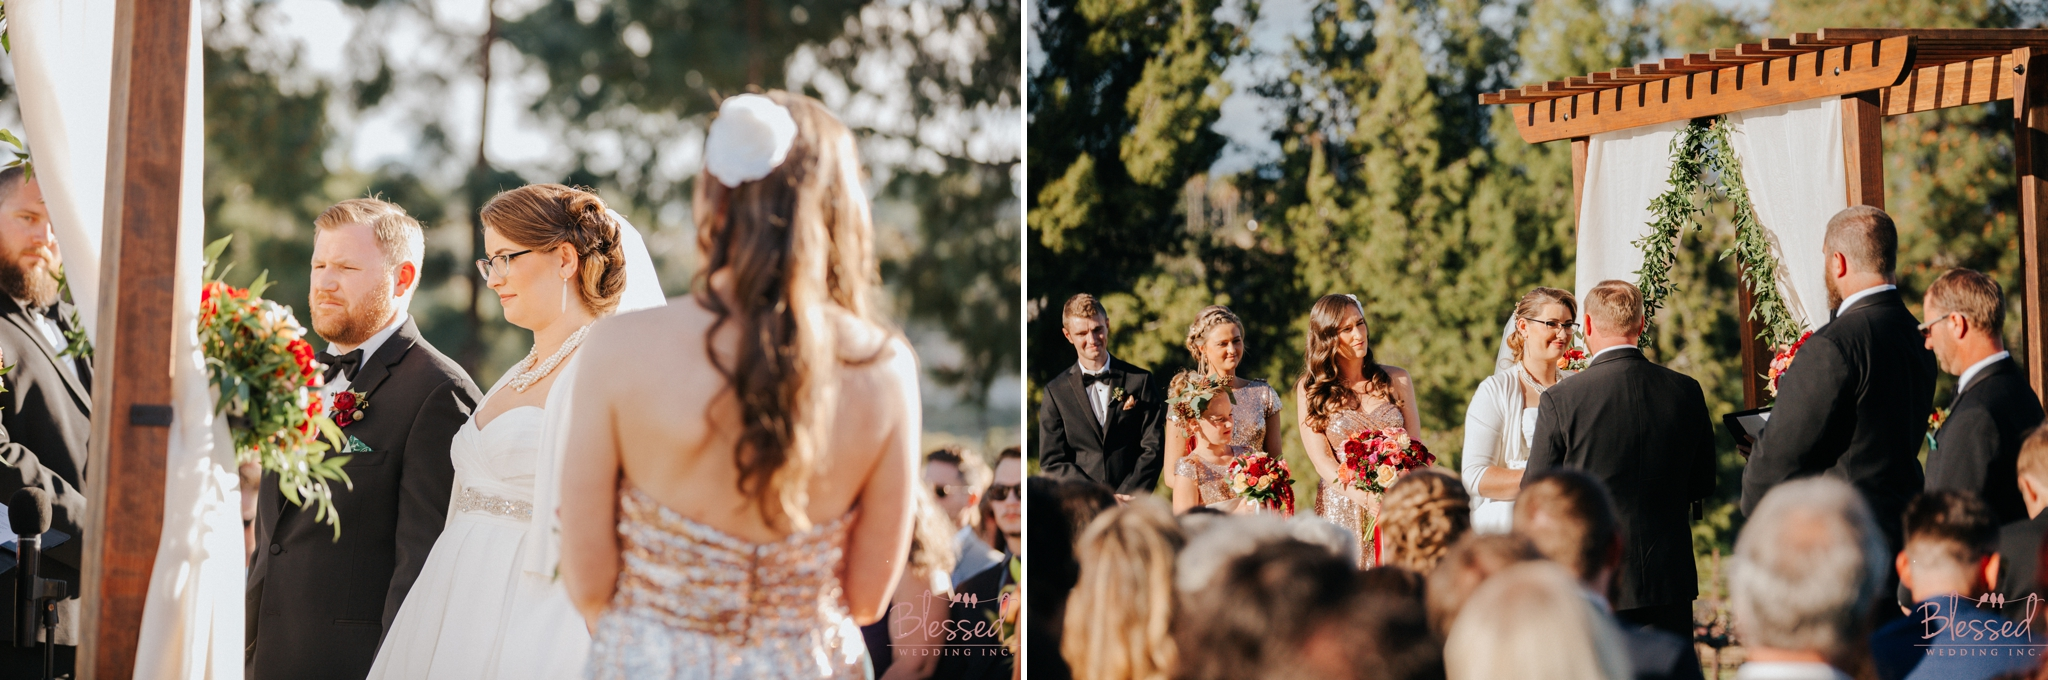 Orfila Vinery Wedding Temecula Wedding Photographer 15.jpg